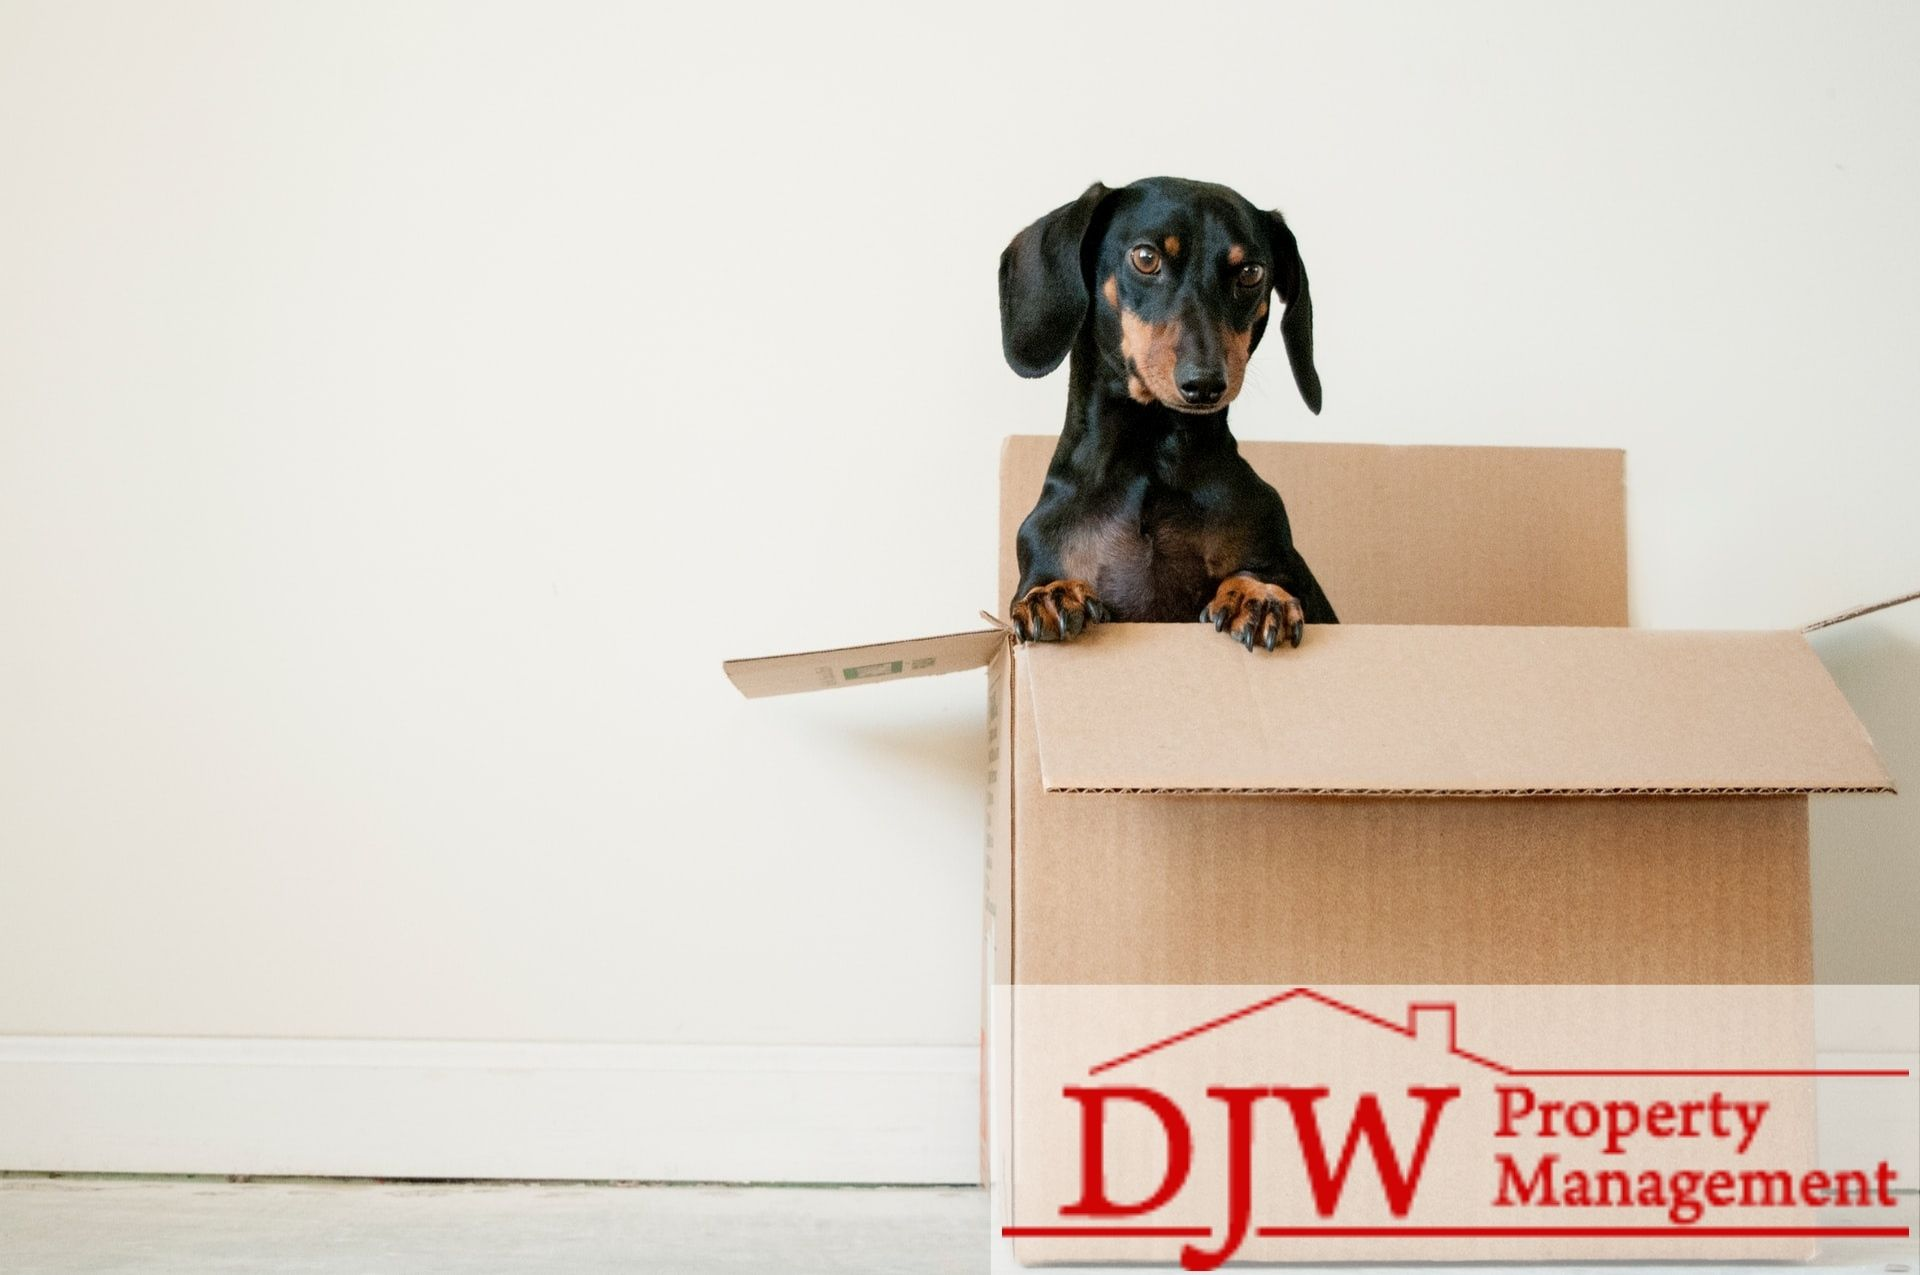 black and brown dog in a cardboard box